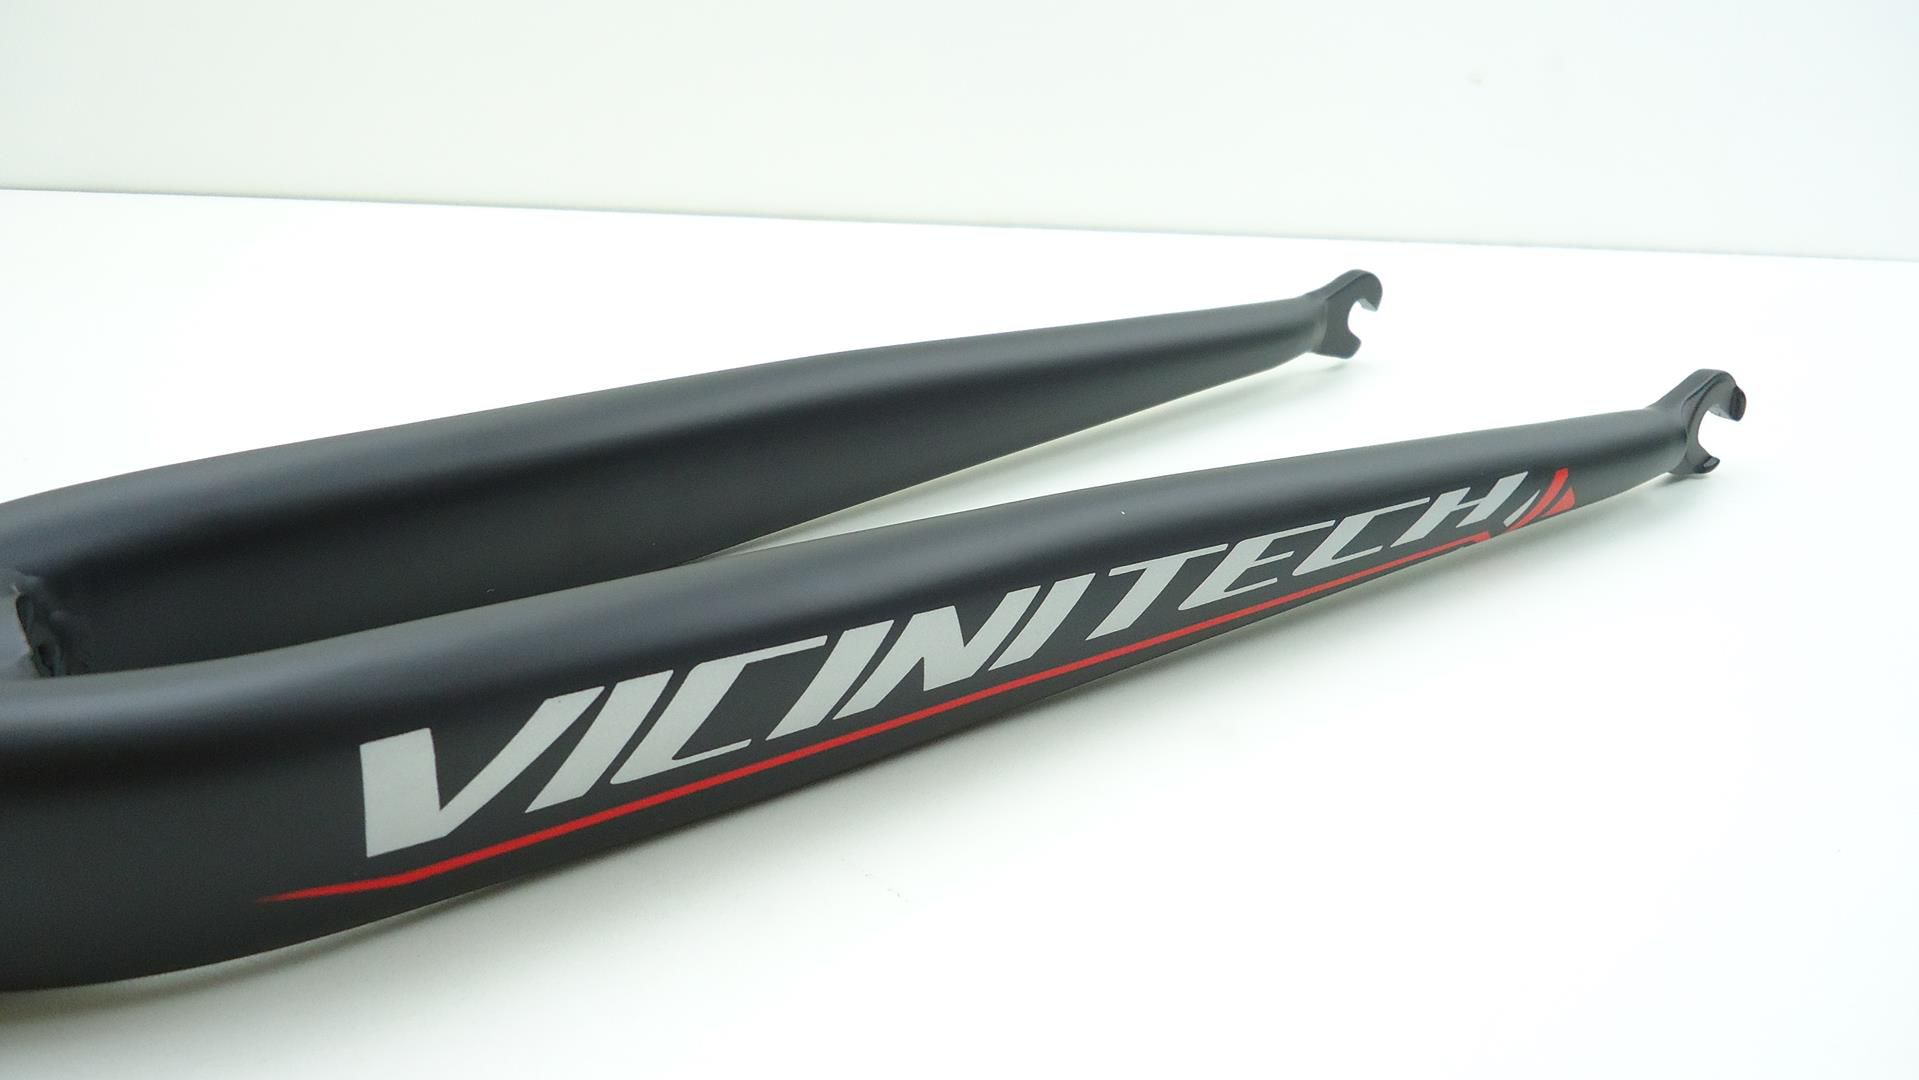 Garfo Bicicleta Speed Vicinitech Aro 700 em Aluminio Espiga Reta